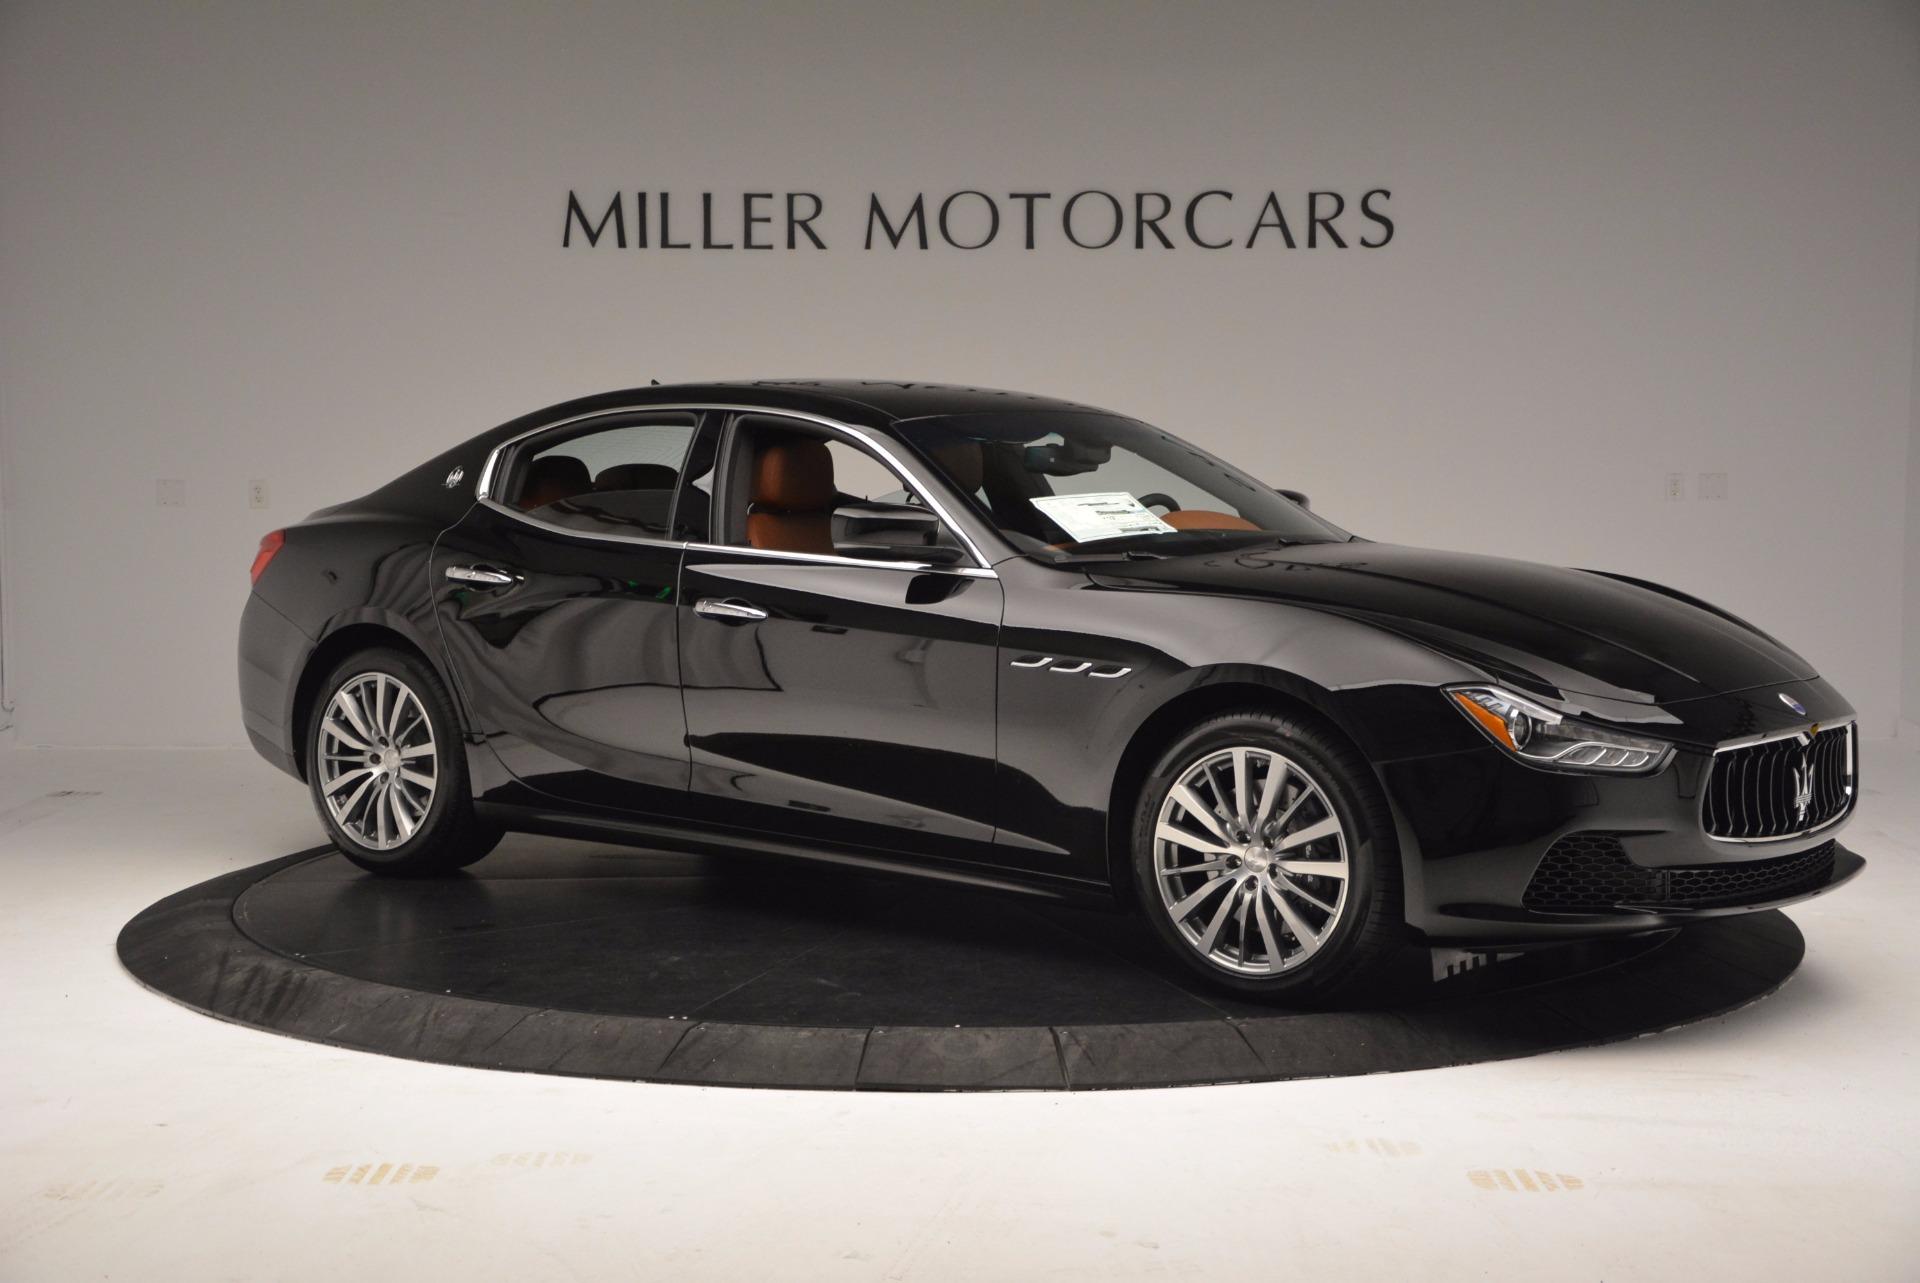 New 2017 Maserati Ghibli S Q4 EX-Loaner For Sale In Westport, CT 1116_p10